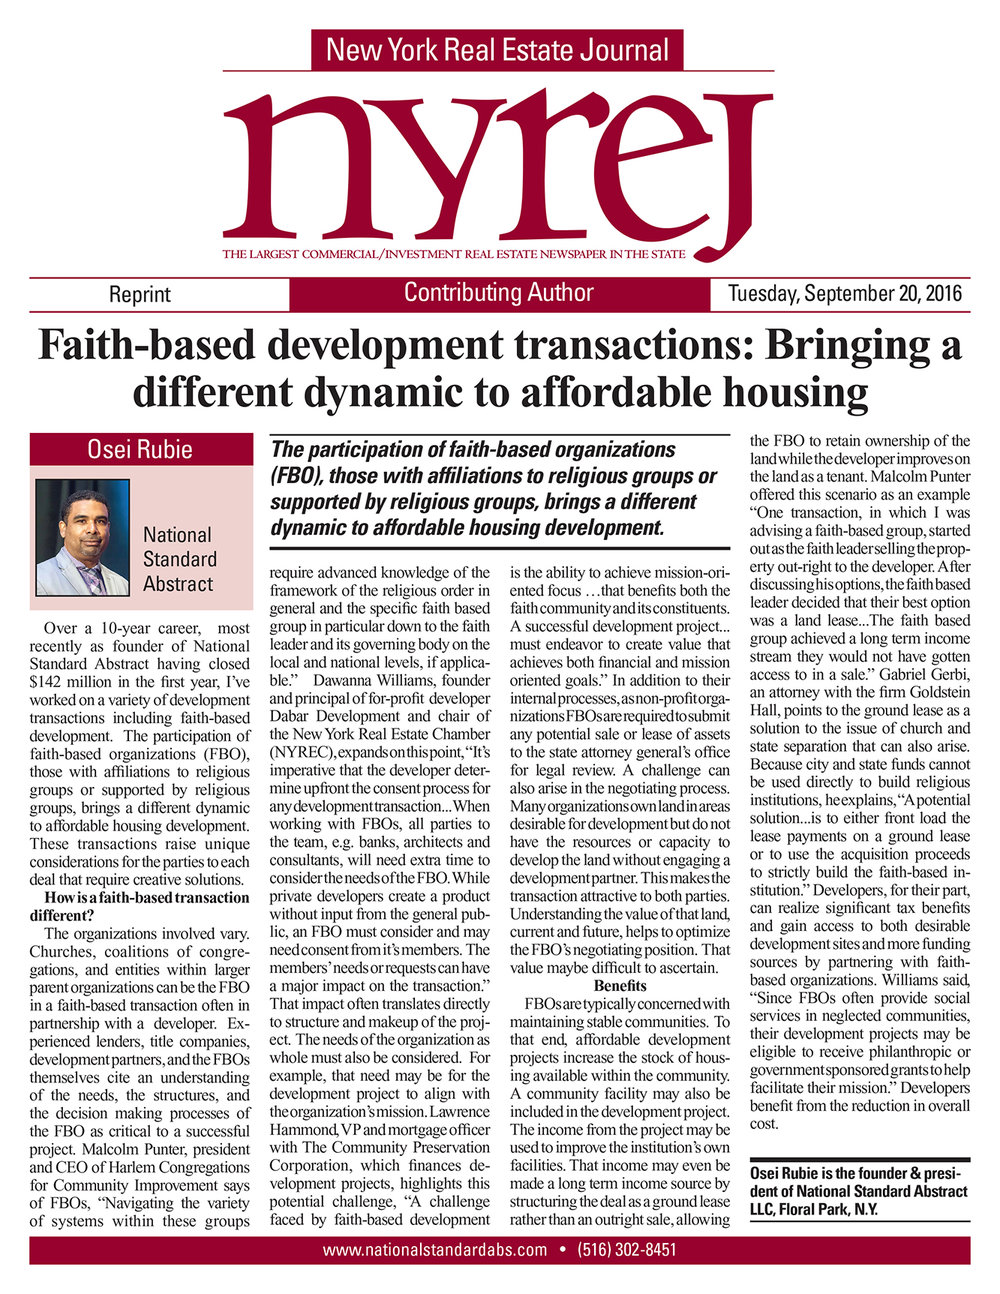 Faith Based Development Article 2016-1.jpg